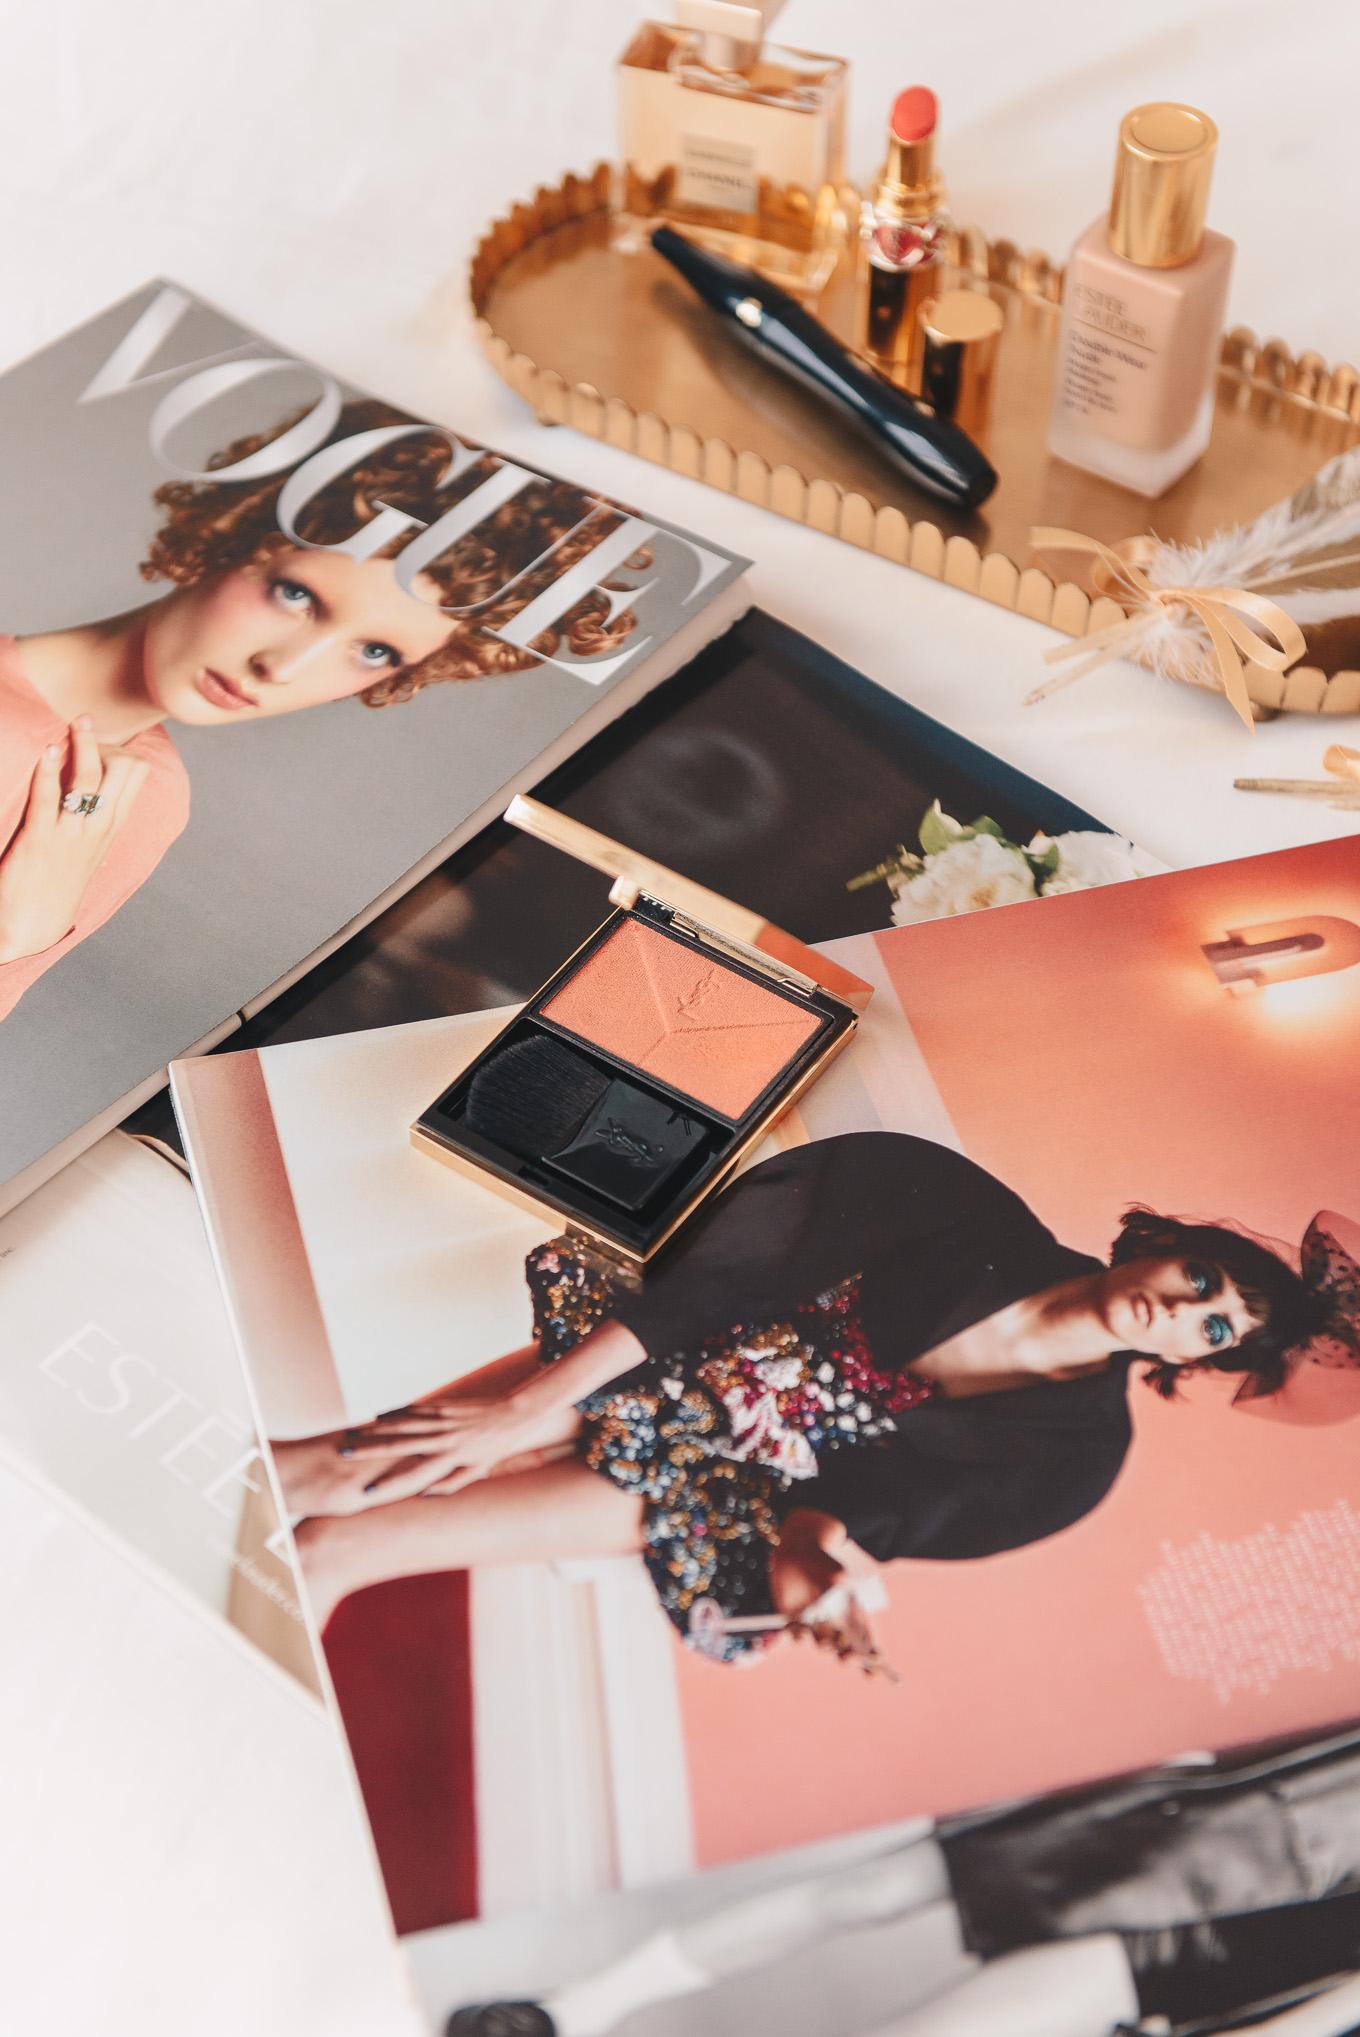 YSL couture blush